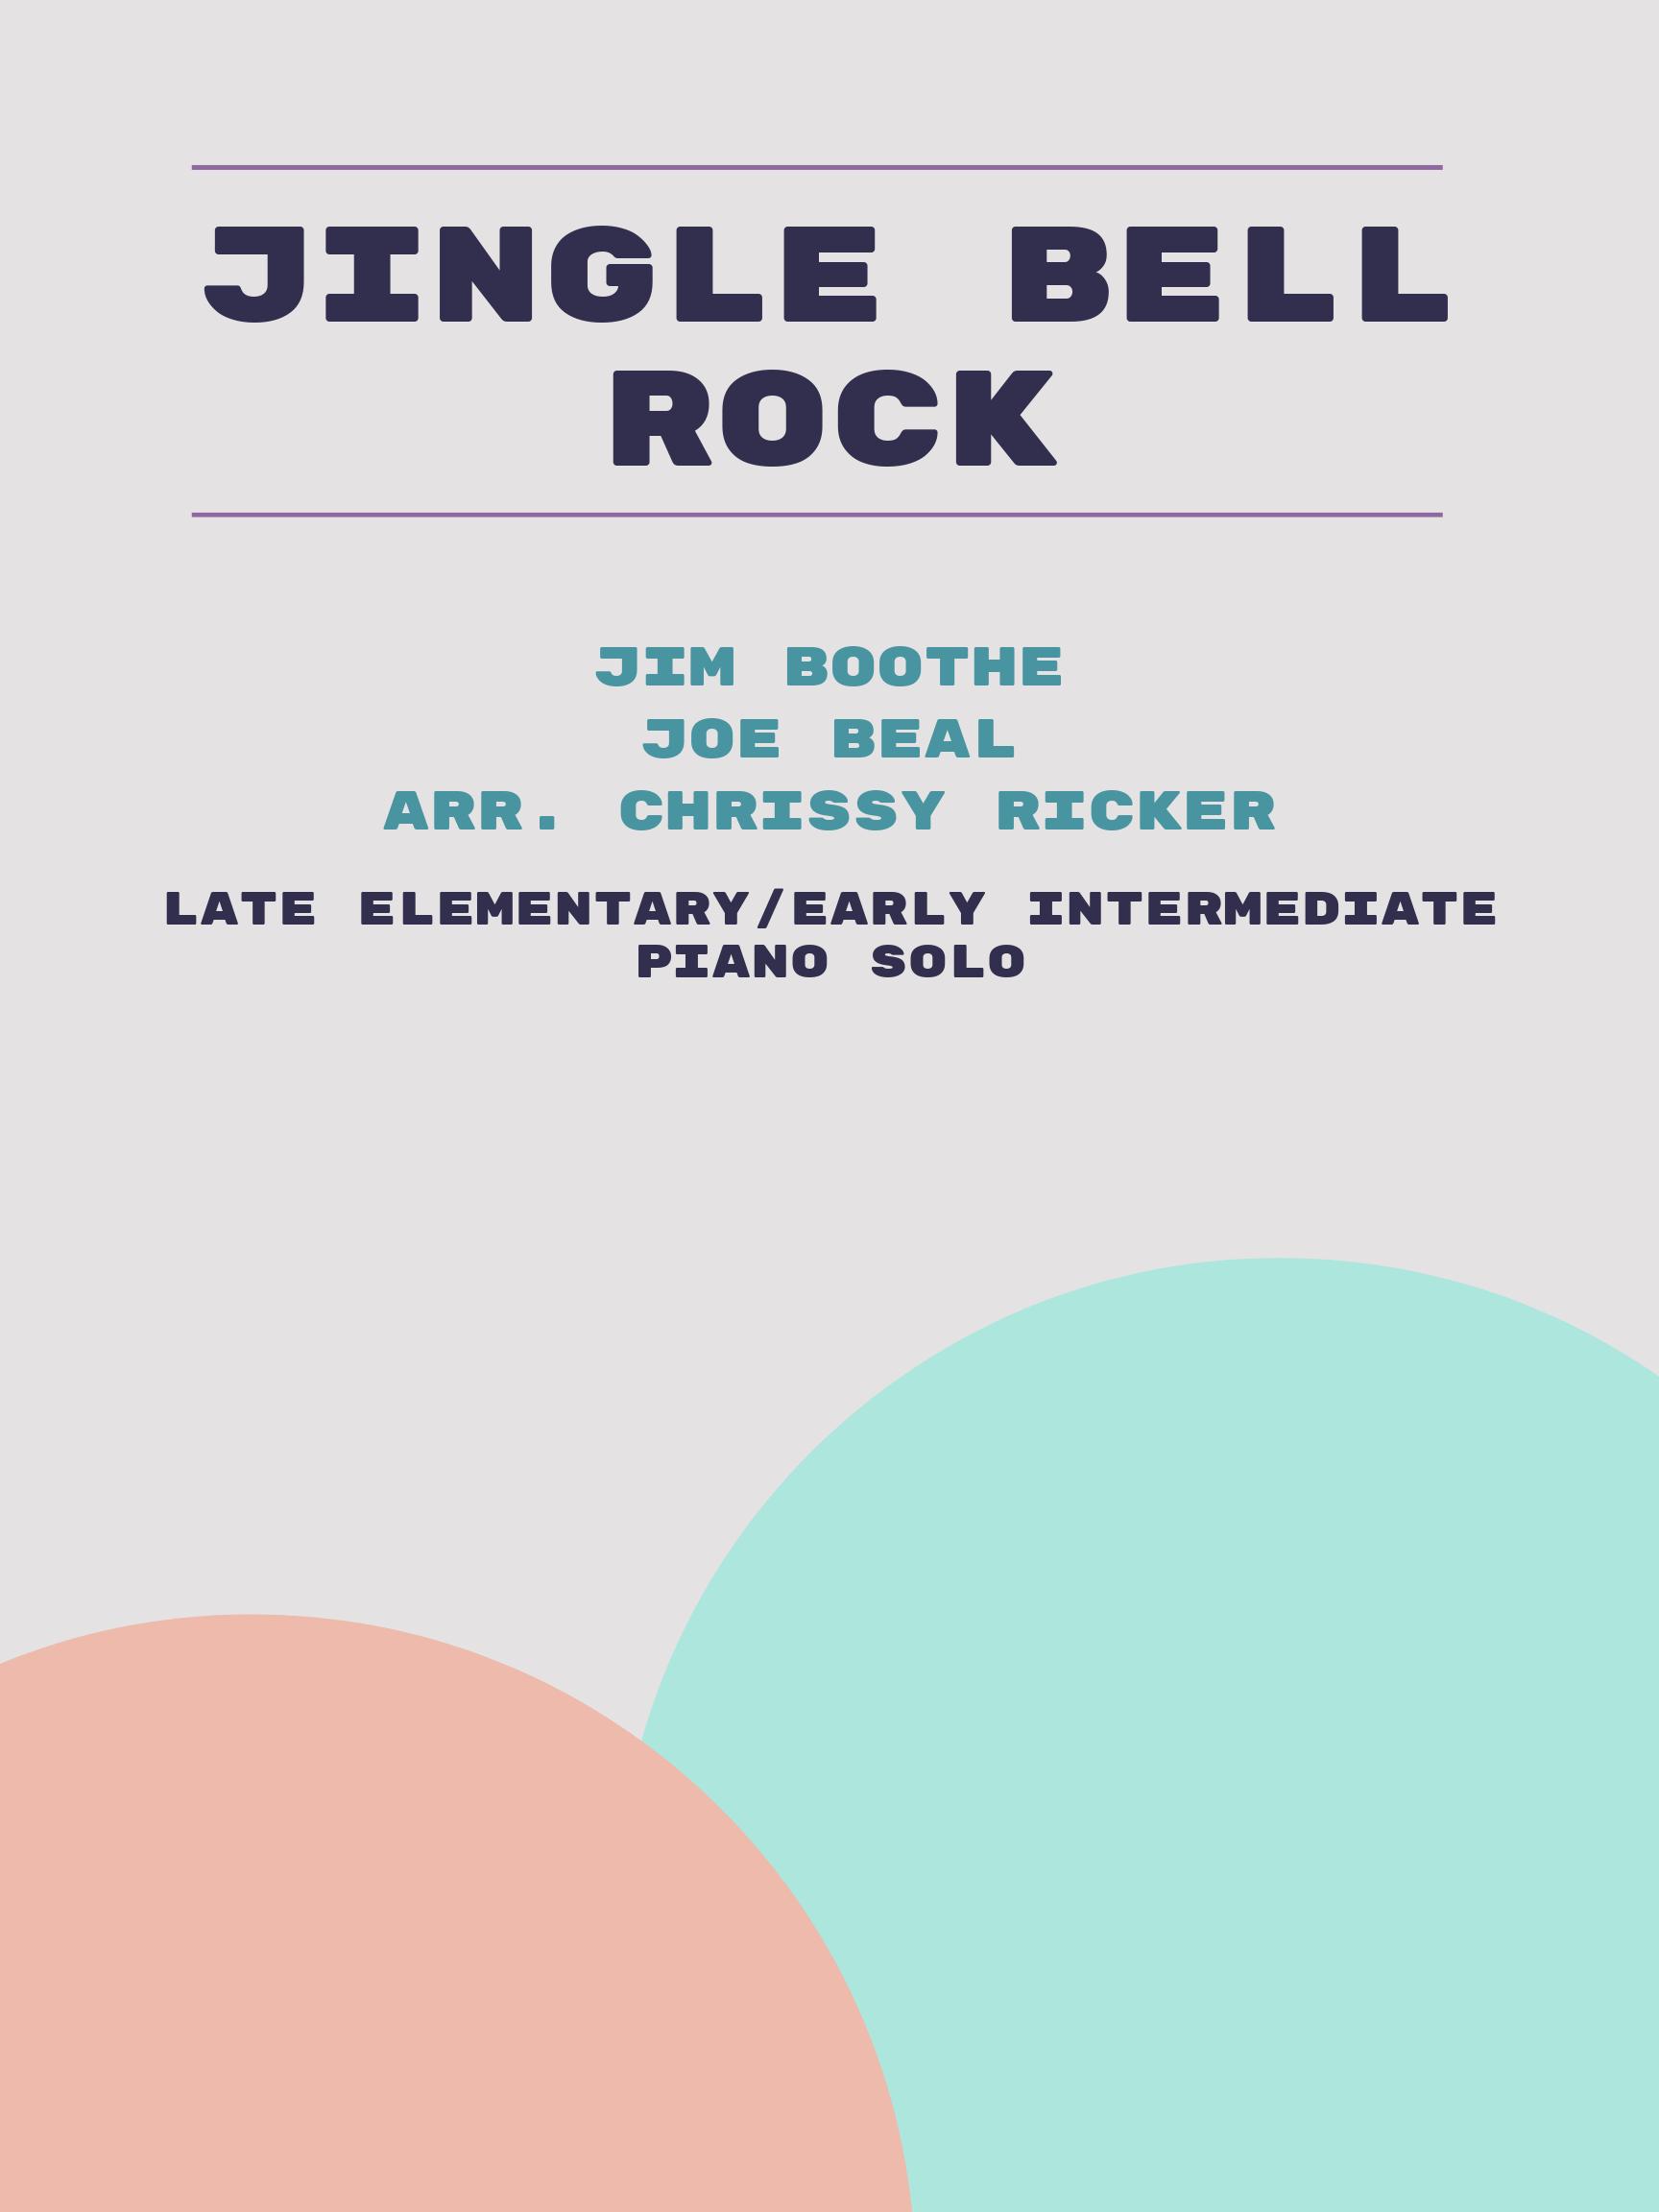 Jingle Bell Rock by Jim Boothe, Joe Beal